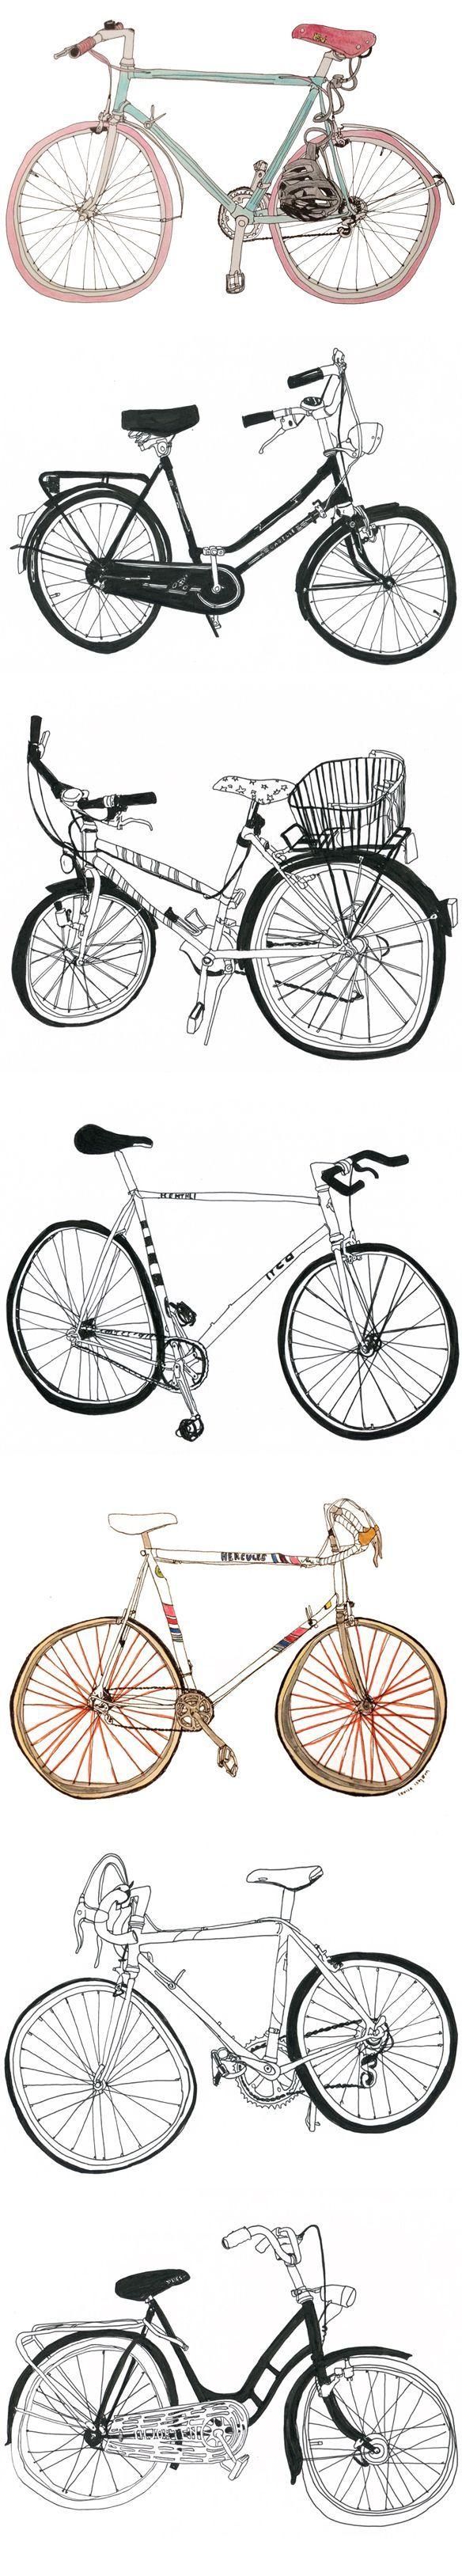 Bikes, by Marion Taschler